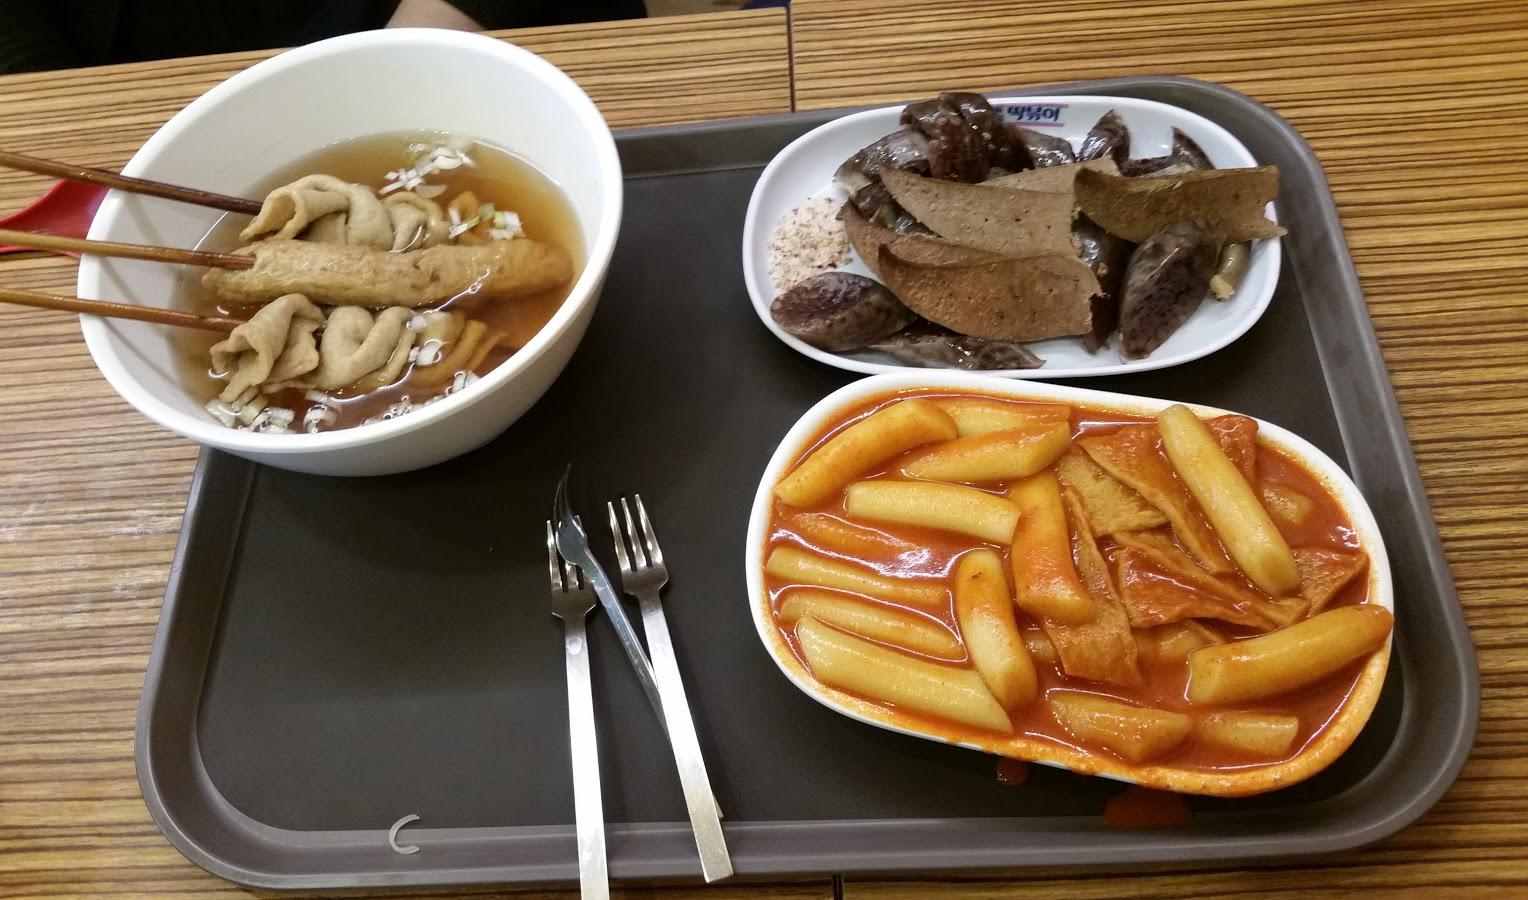 Hongdae - Tteokbokki, Sundae, and Eomuk